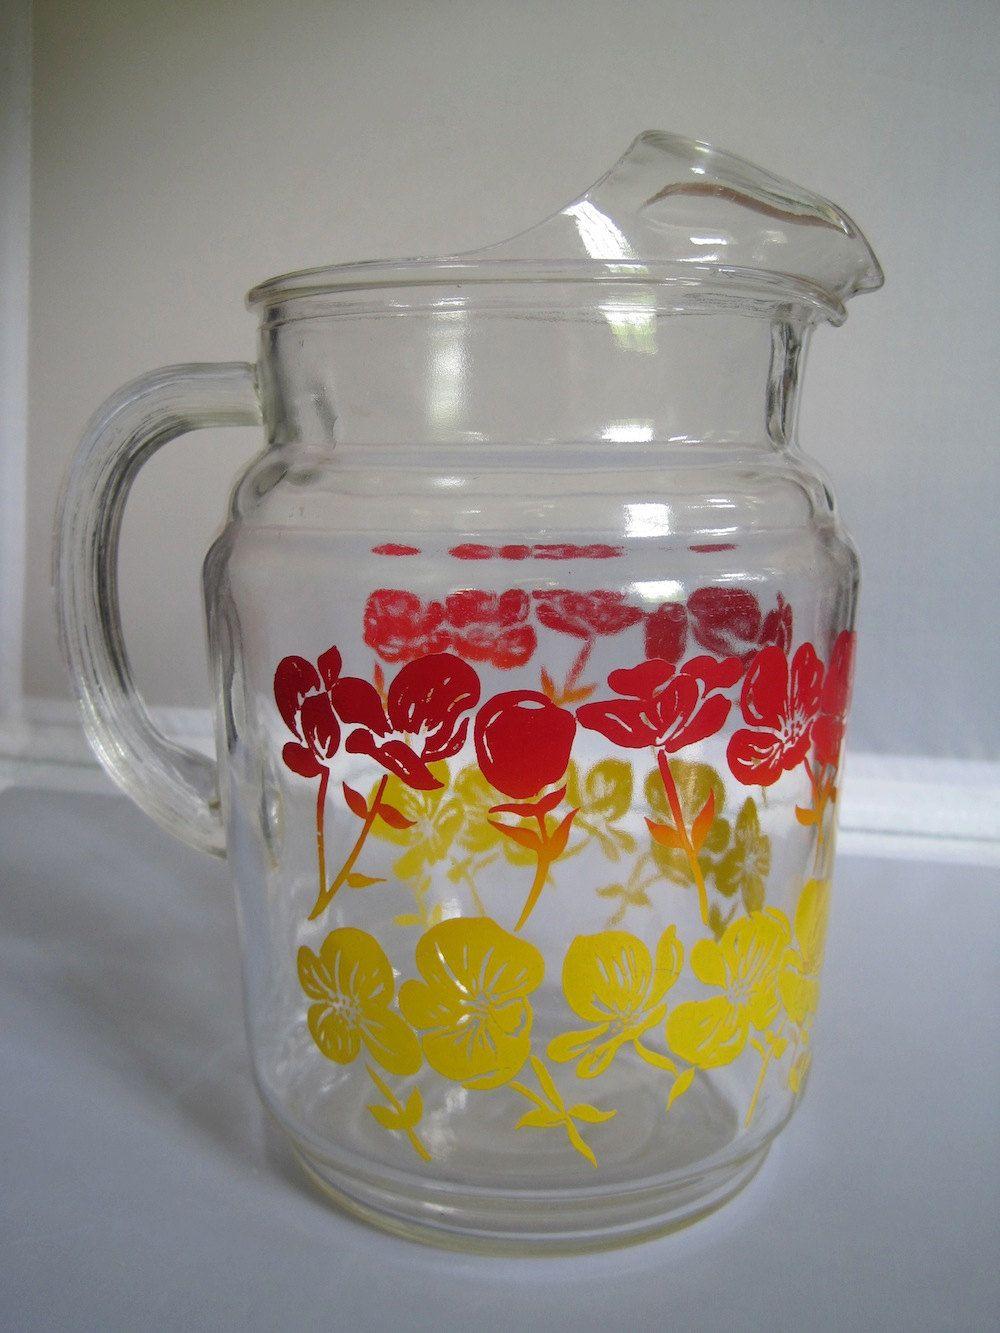 Vintage Glass Pitcher- Gosh Kool-aid